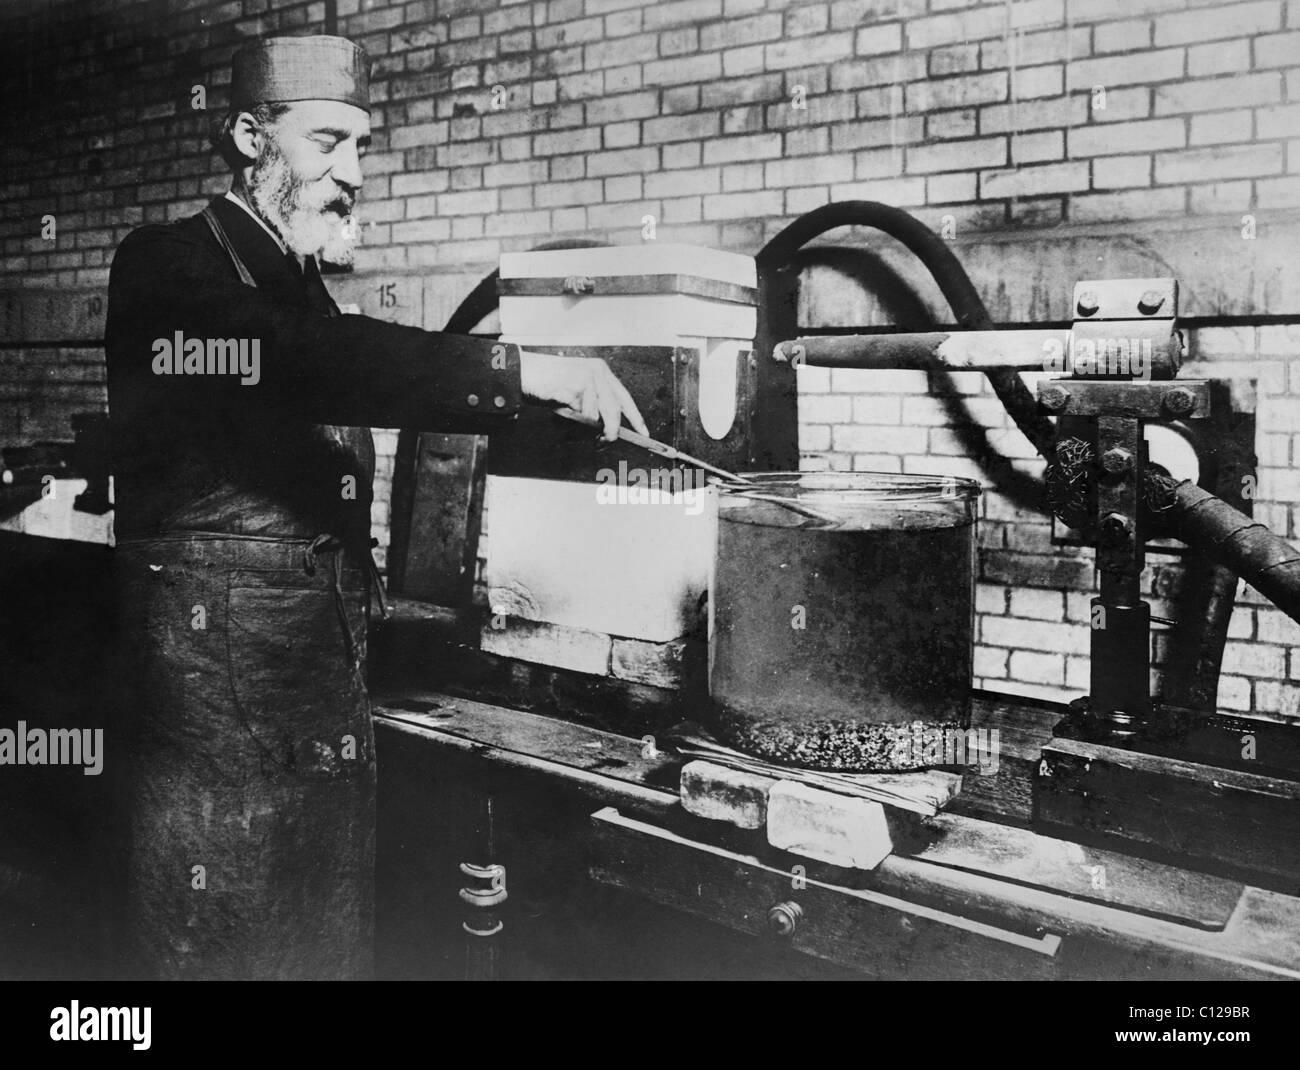 French chemist Henri Moissan (1852 - 1907) - winner of the Nobel Prize in Chemistry in 1906 - attempting to make - Stock Image